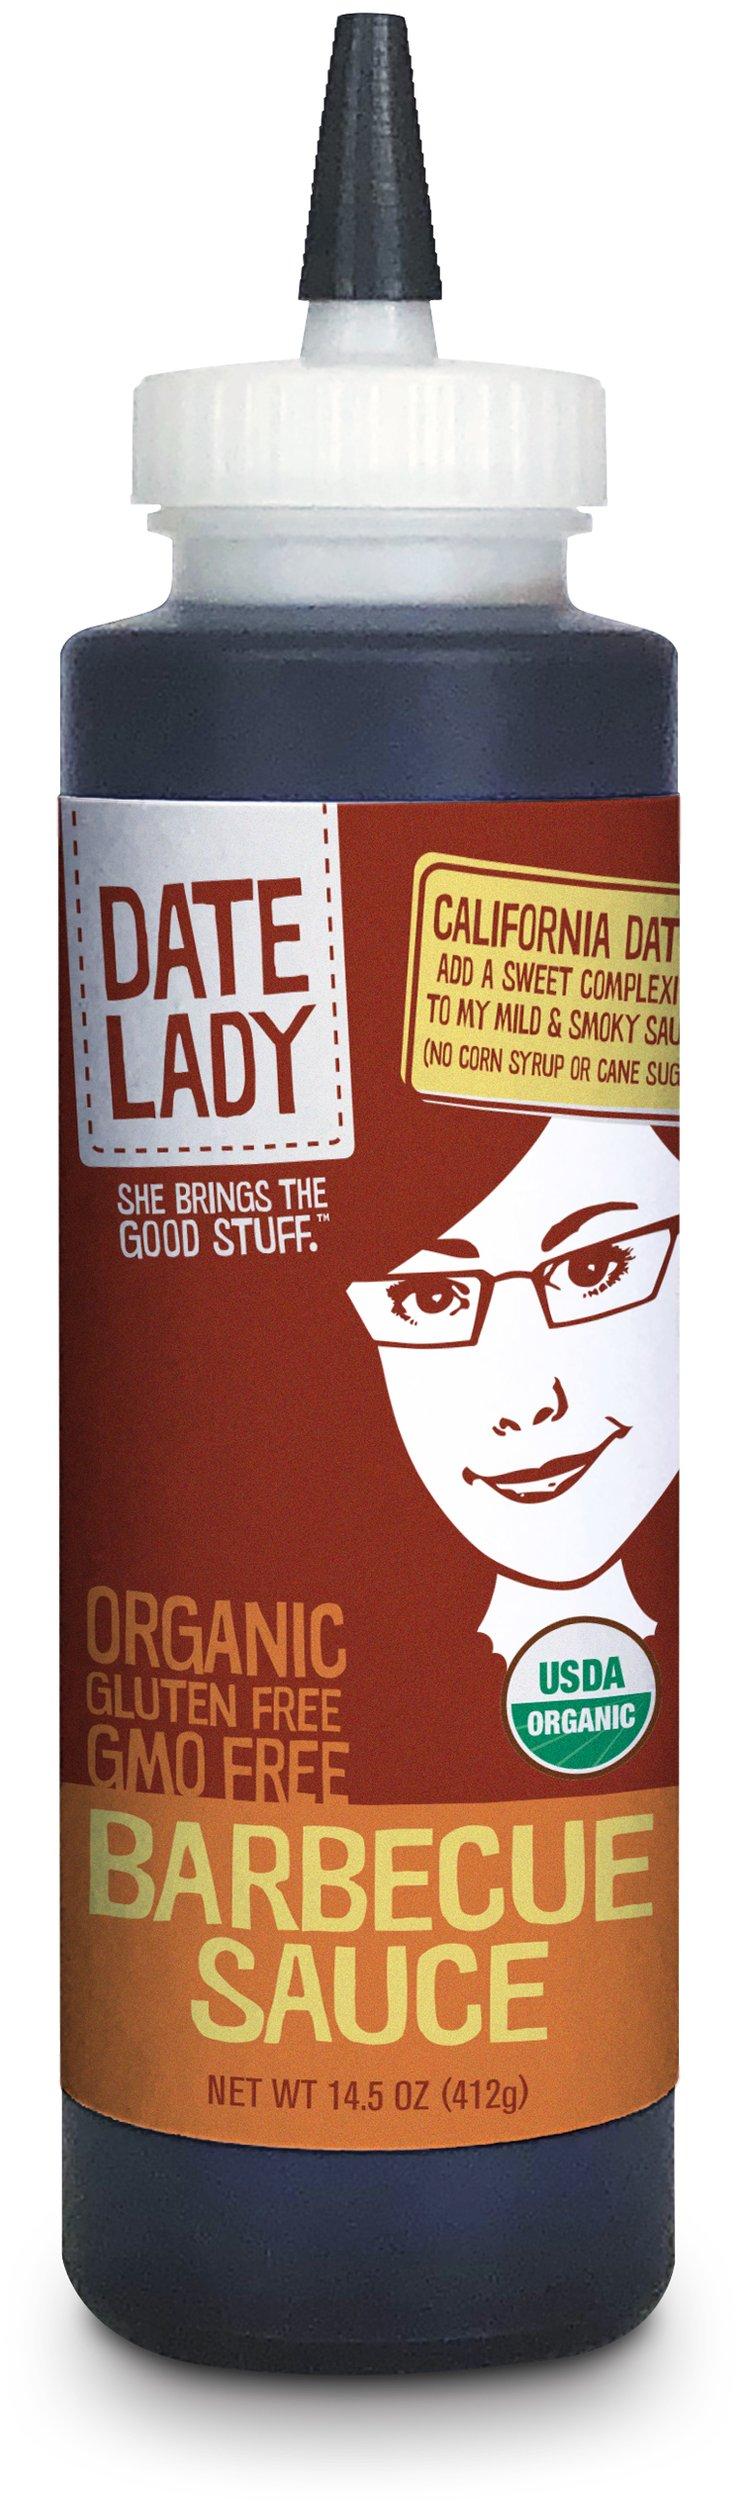 Date_Lady_Barbecue_Sauce_14.5oz_740x.jpg